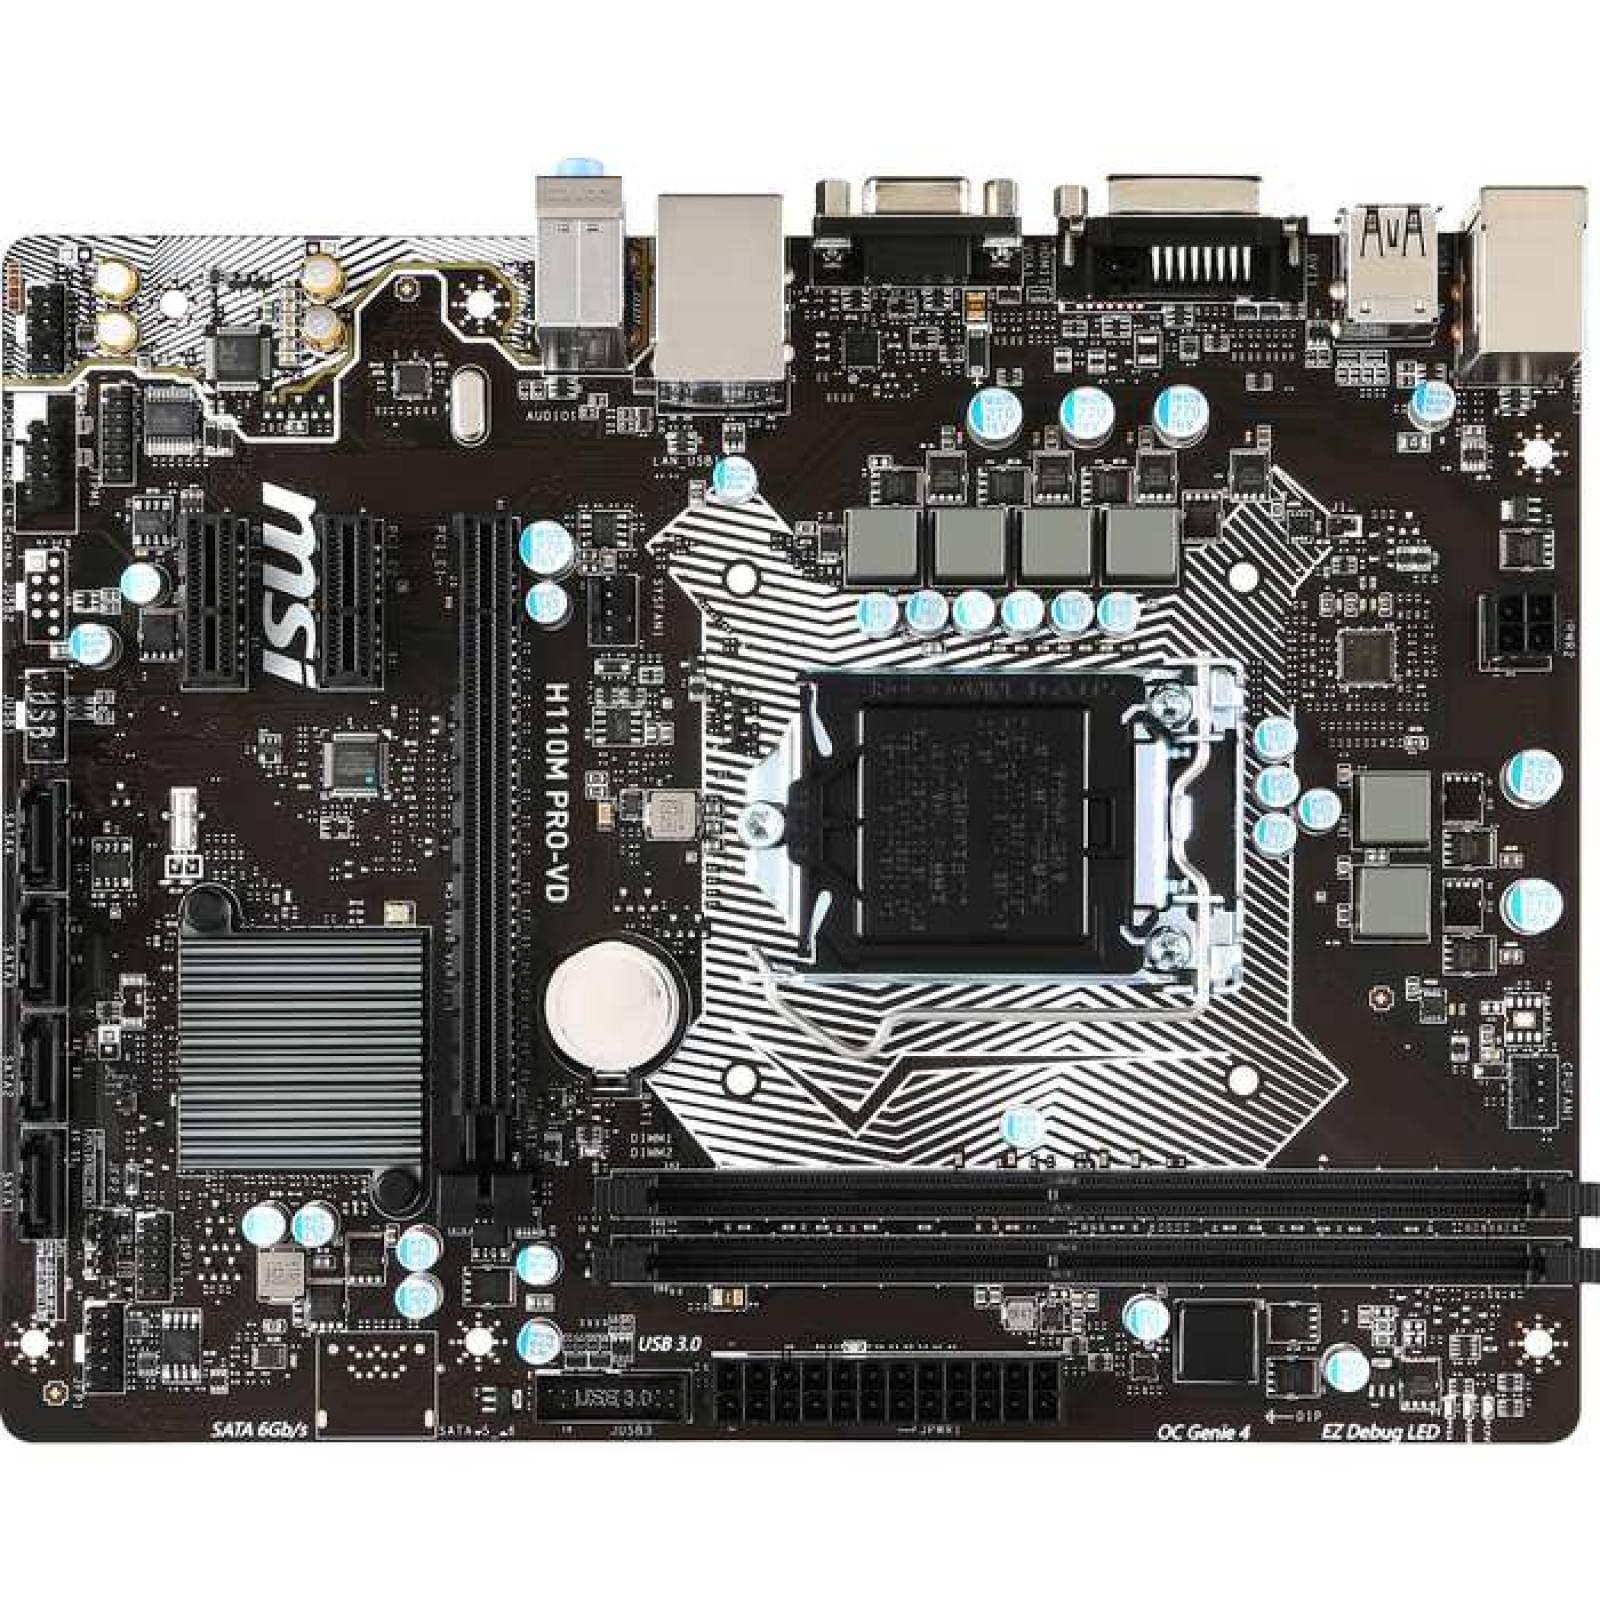 Placa madre de escritorio MSI H110M PROVD  Chipset Intel  Socket H4 LGA1151